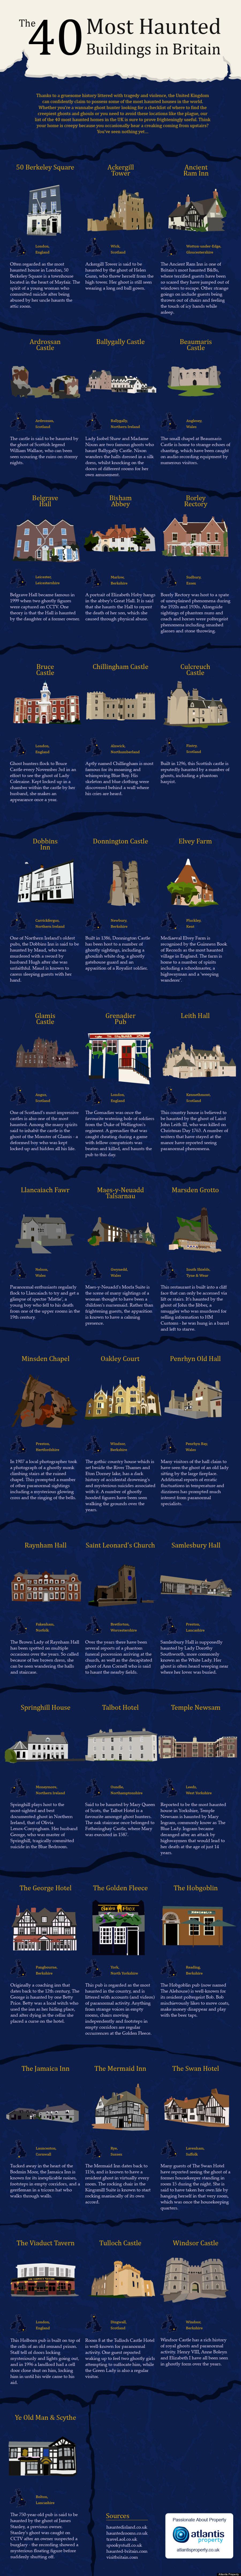 40 most haunted buildings in britain